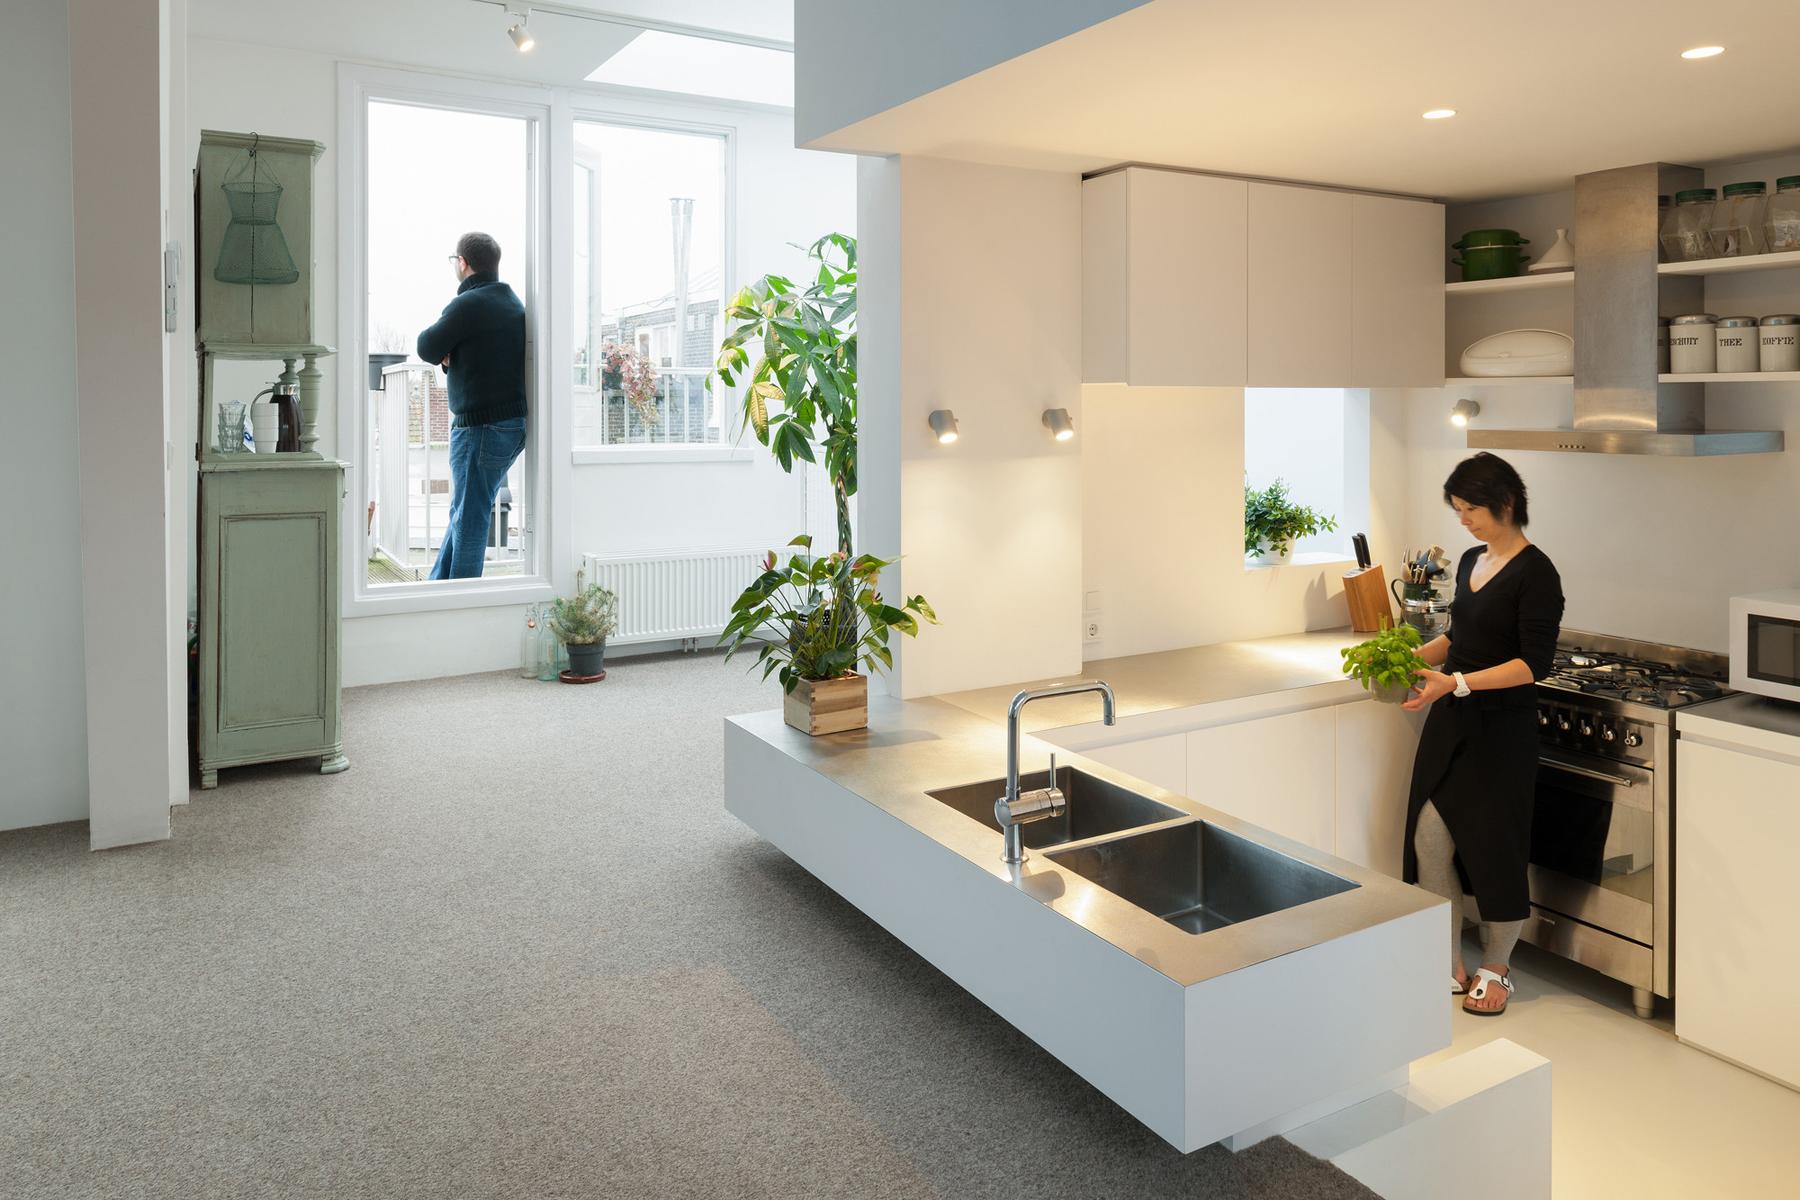 Unique Modern Attic Duplex Apartment In Amsterdam With Clean